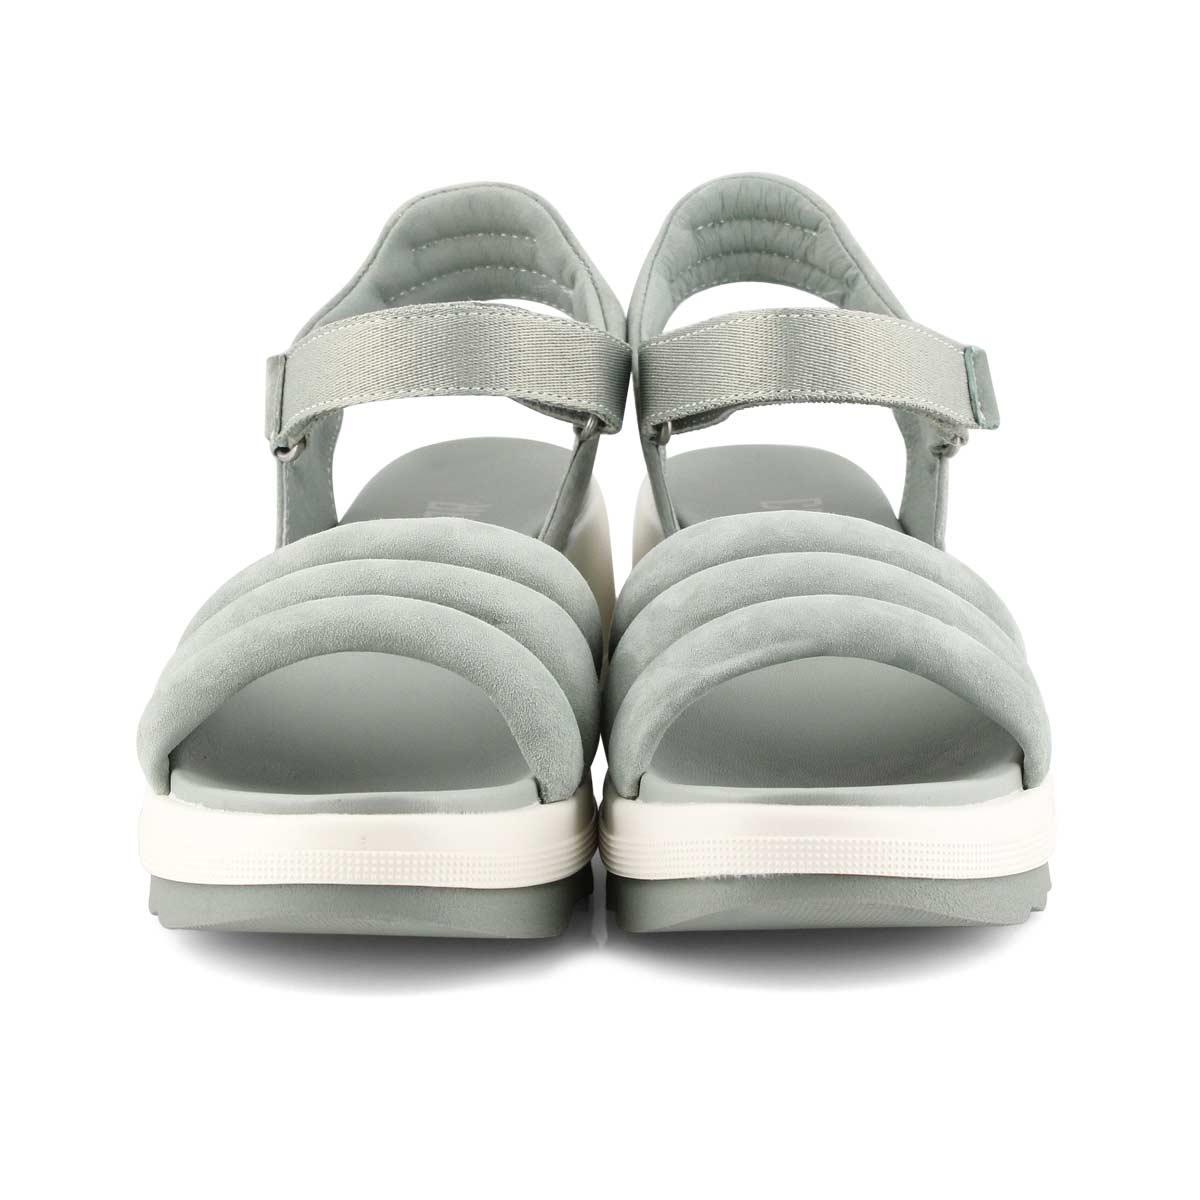 Lds Honey sage wedge sandal